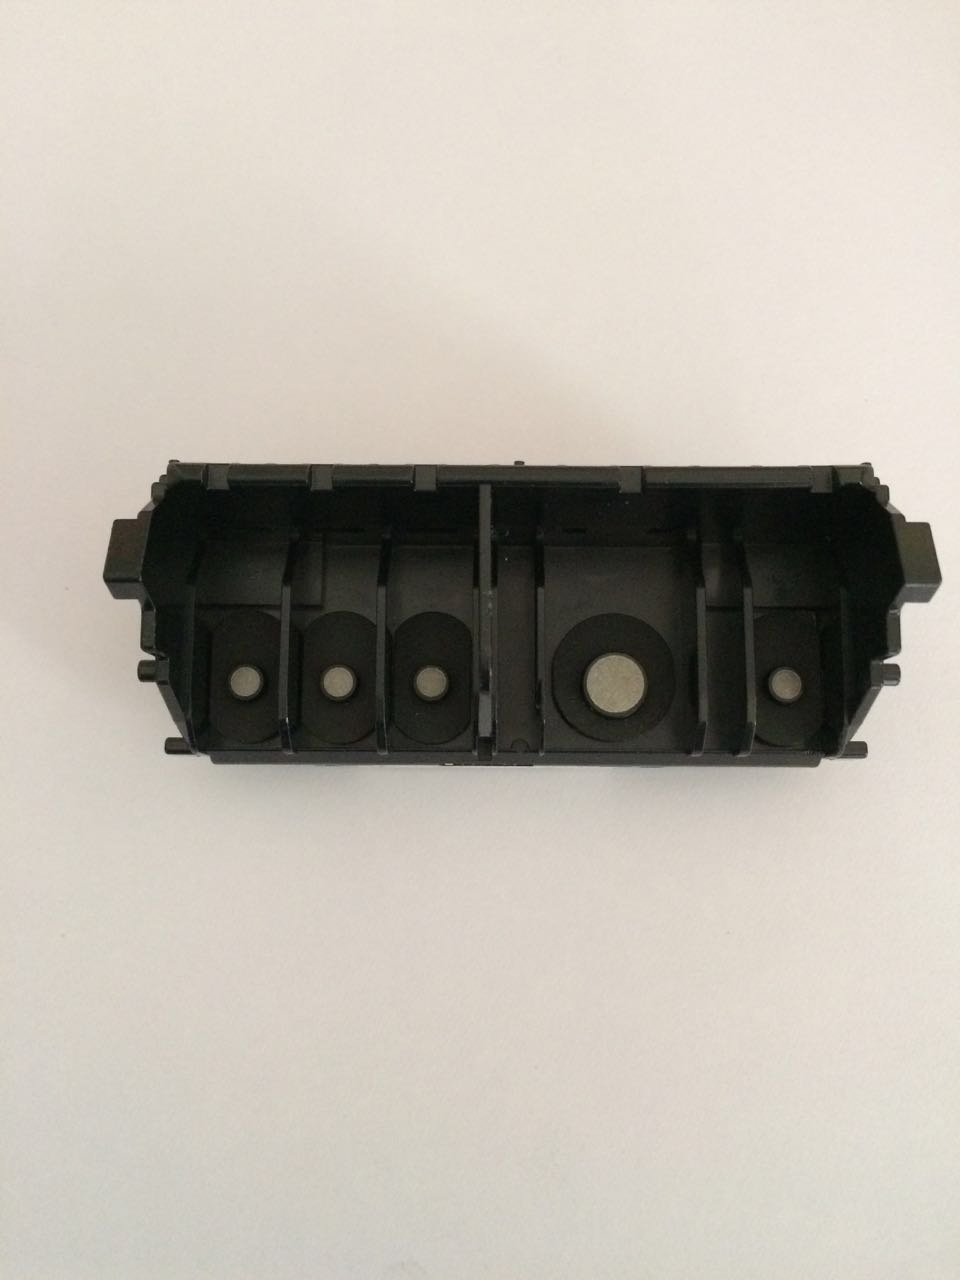 PRINT HEAD QY6 0086 PRINTHEAD FOR Canon ix6820  mx721  mx722  mx725  mx726  mx727 mx922 IX6850 IP6840|Printer Parts| |  - title=